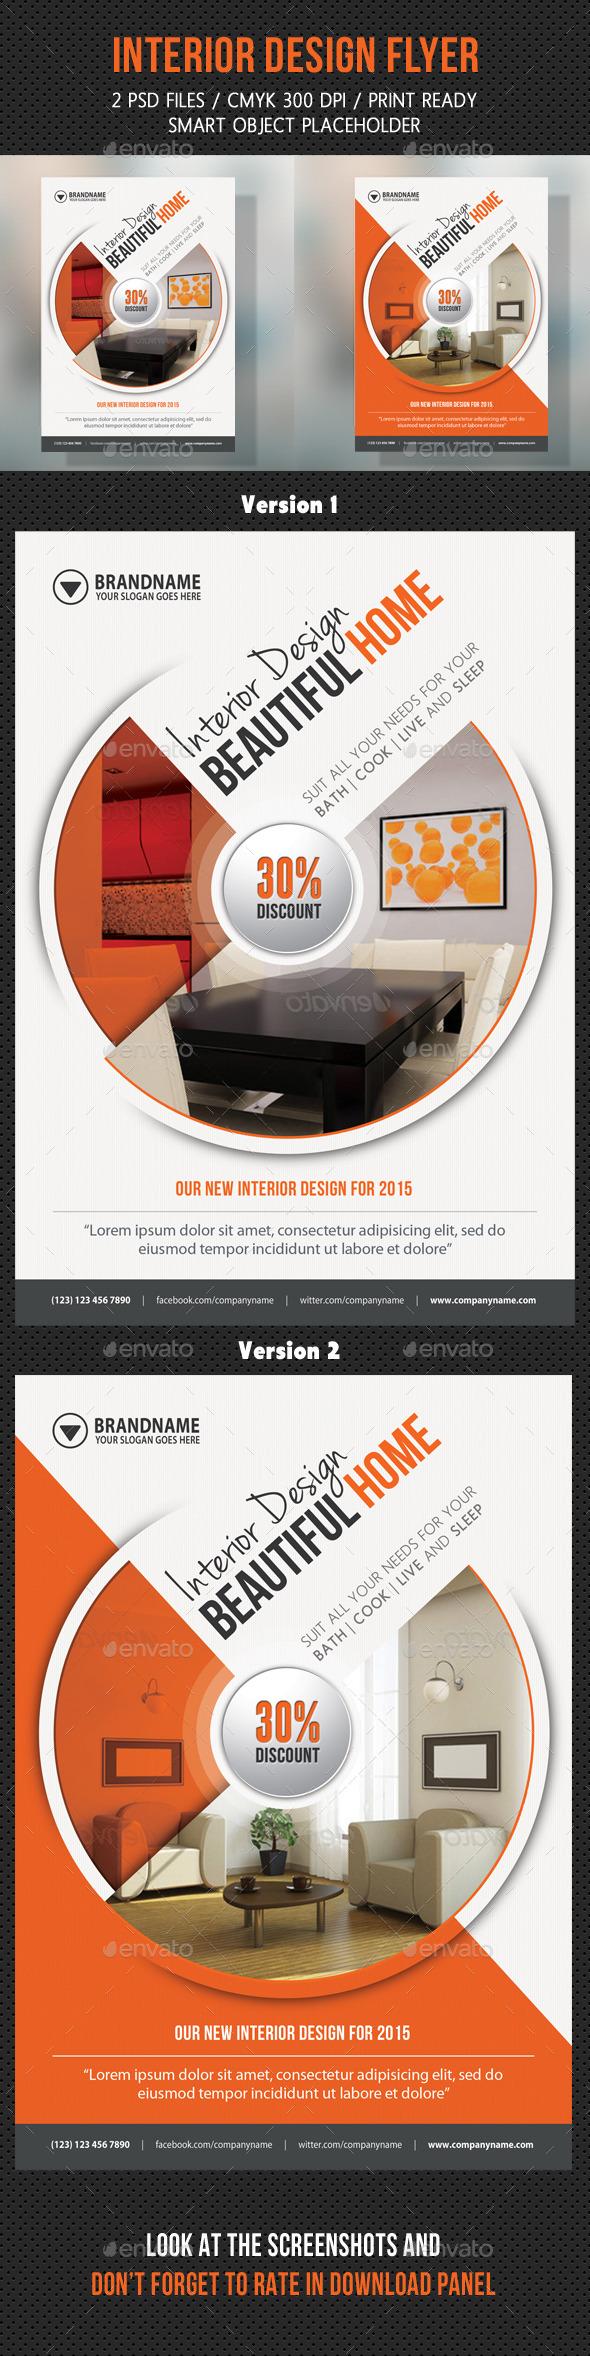 GraphicRiver Interior Design Flexible Flyer 9001439